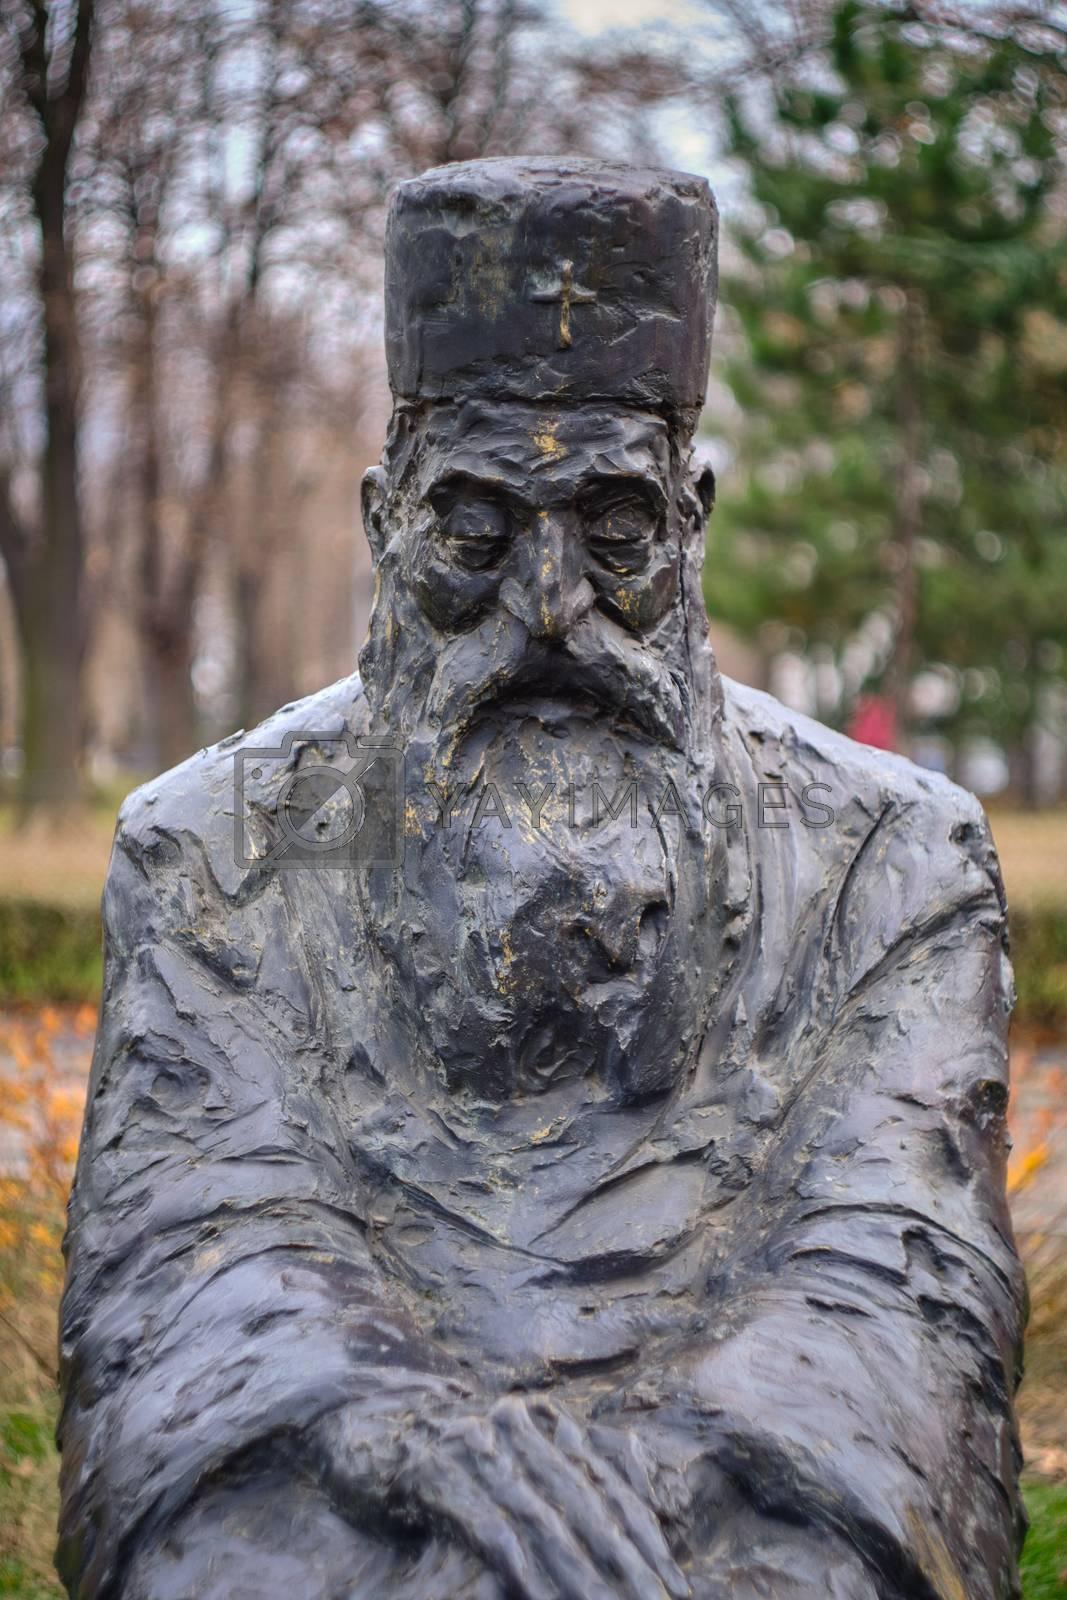 Belgrade / Serbia - December 21, 2019: Statue of Serbian Patriarch Pavle, the 44th Patriarch of the Serbian Orthodox Church, in Tasmajdan park near St. Mark's Church in Belgrade, Serbia